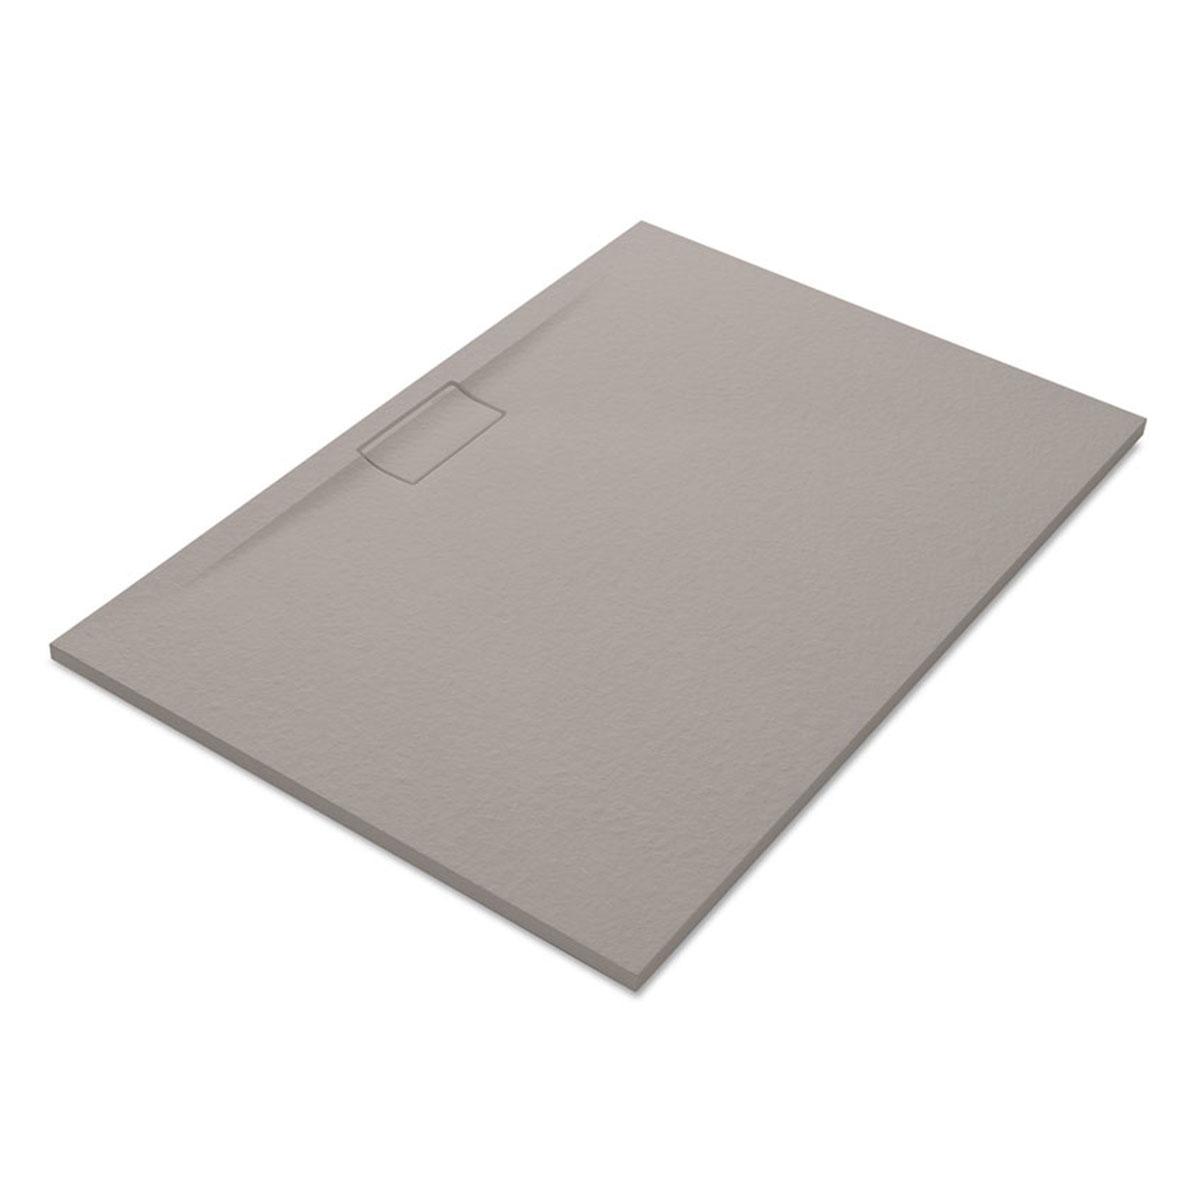 Plato de ducha rectangular 120x80 Nova Stone Cover Fango